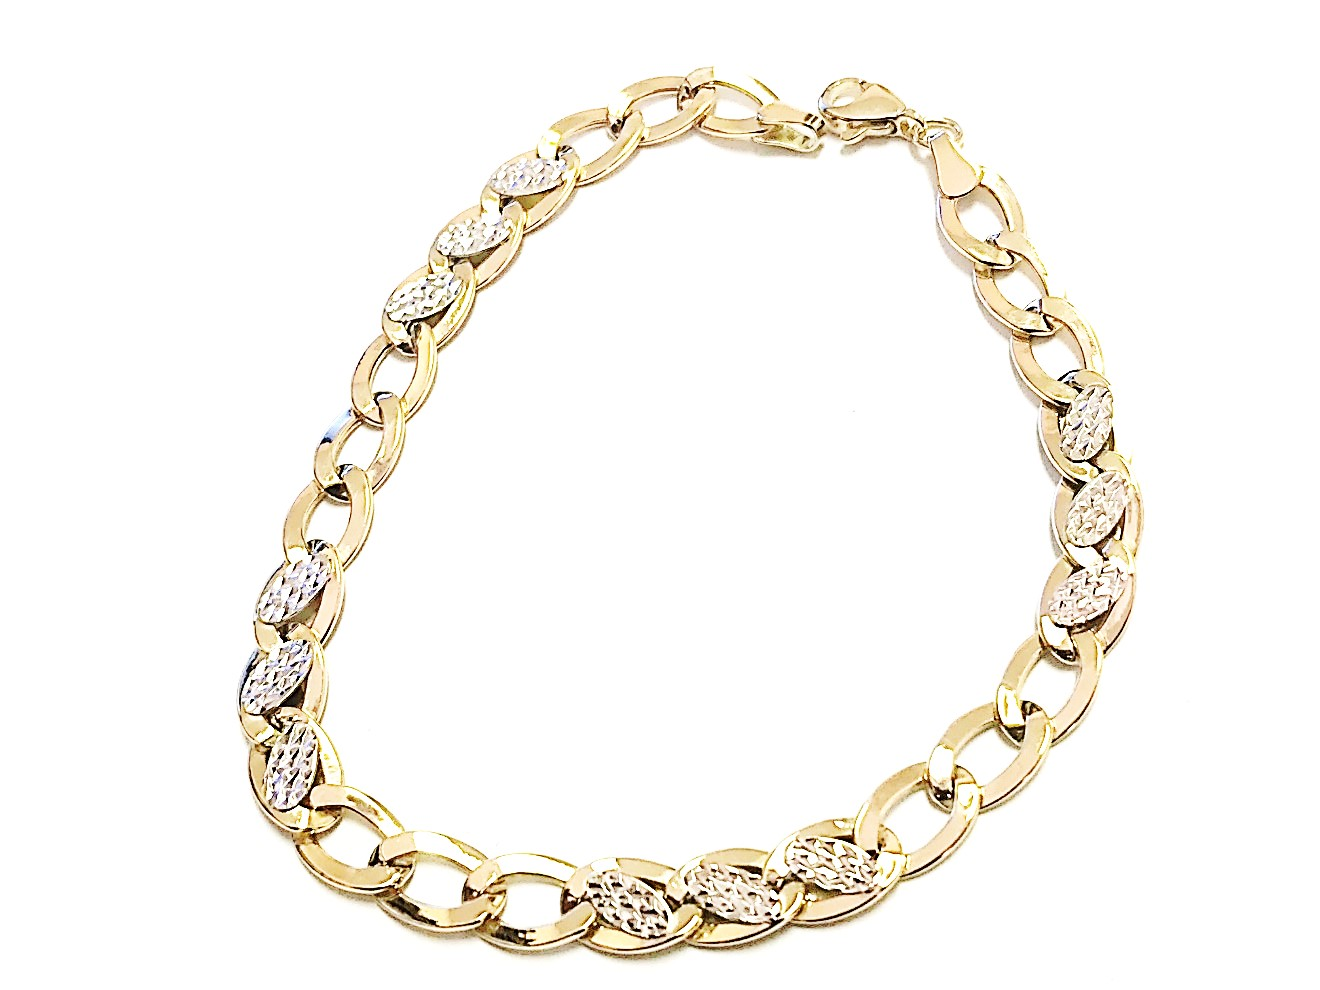 Bracelet for man - 10K 2 tone gold